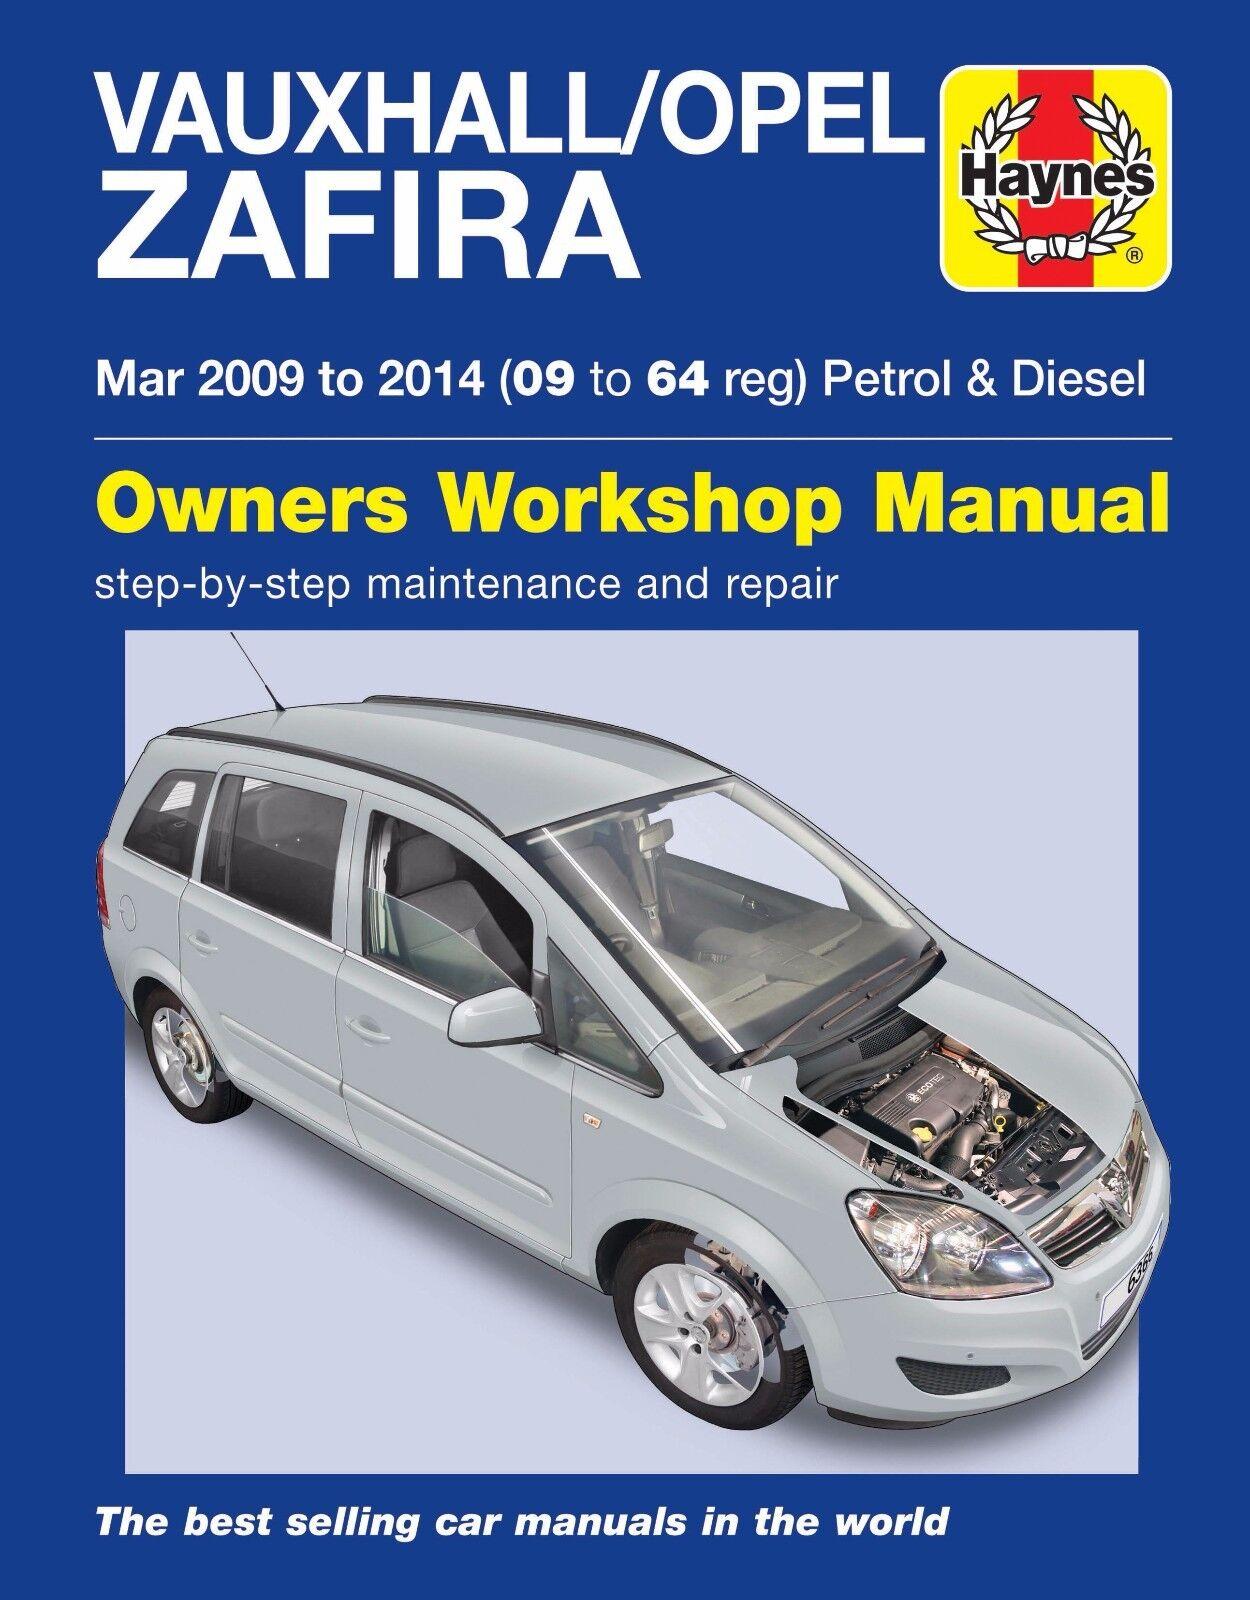 haynes manual 6366 vauxhall opel zafira 1 6 1 8 petrol 1 7 1 9 rh extensivefad top vauxhall zafira workshop manual vauxhall zafira workshop manual